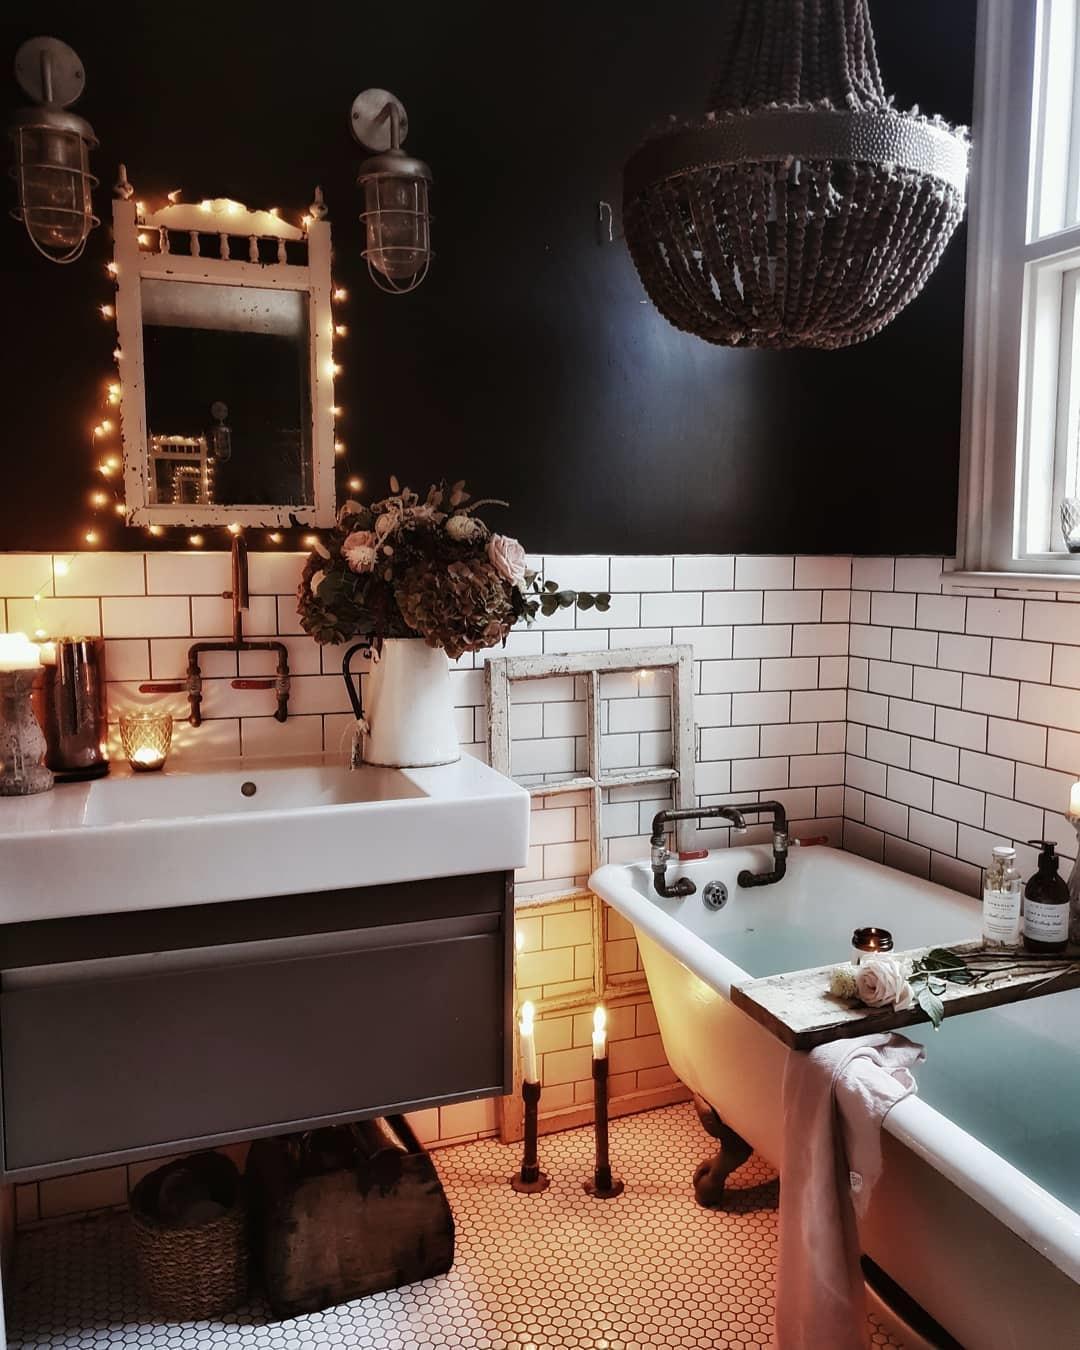 Monochrome bathroom by Malmo & Moss